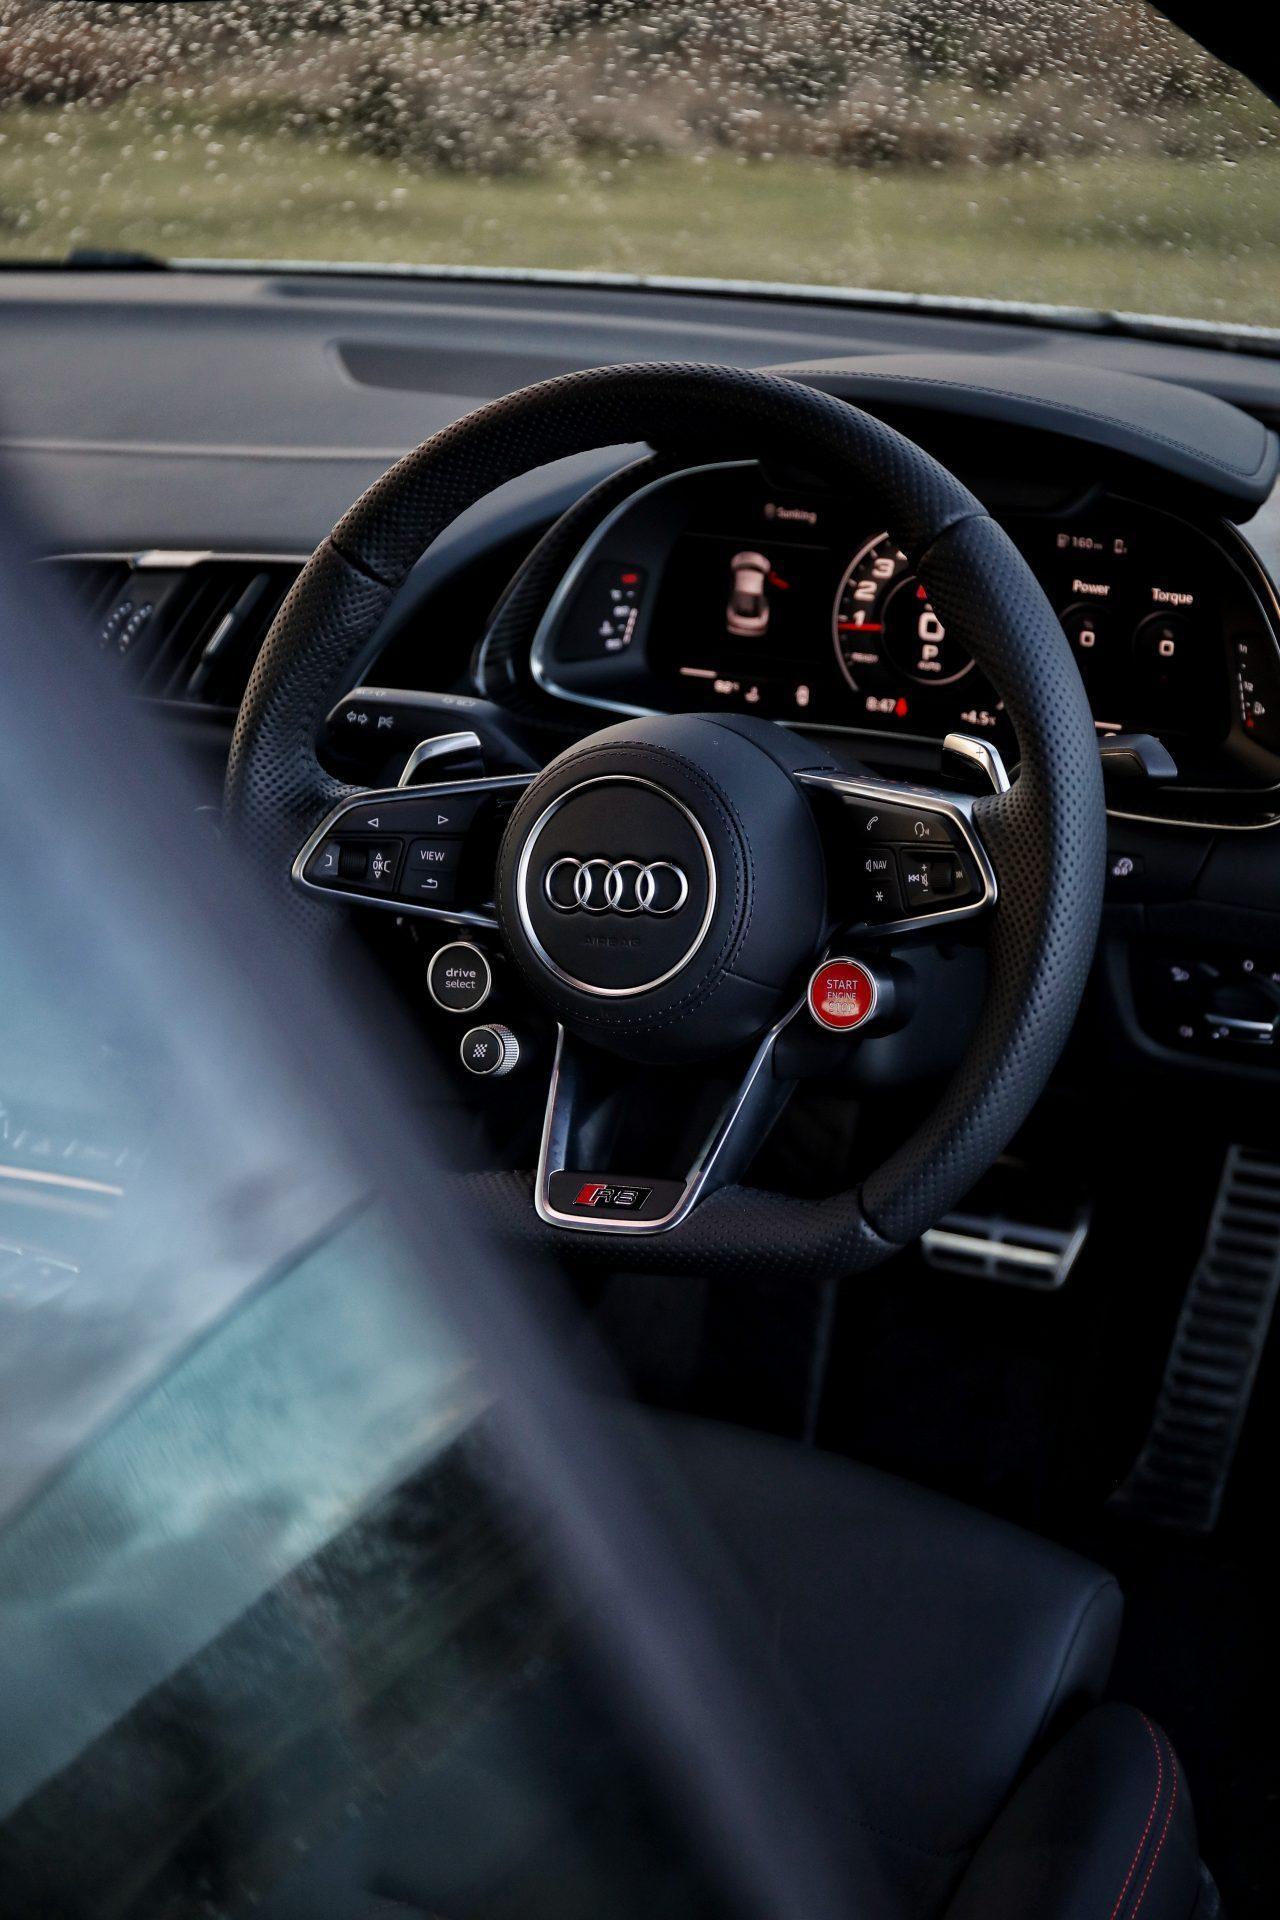 Audi R8 V10 Twenty First Century Gent Car Review